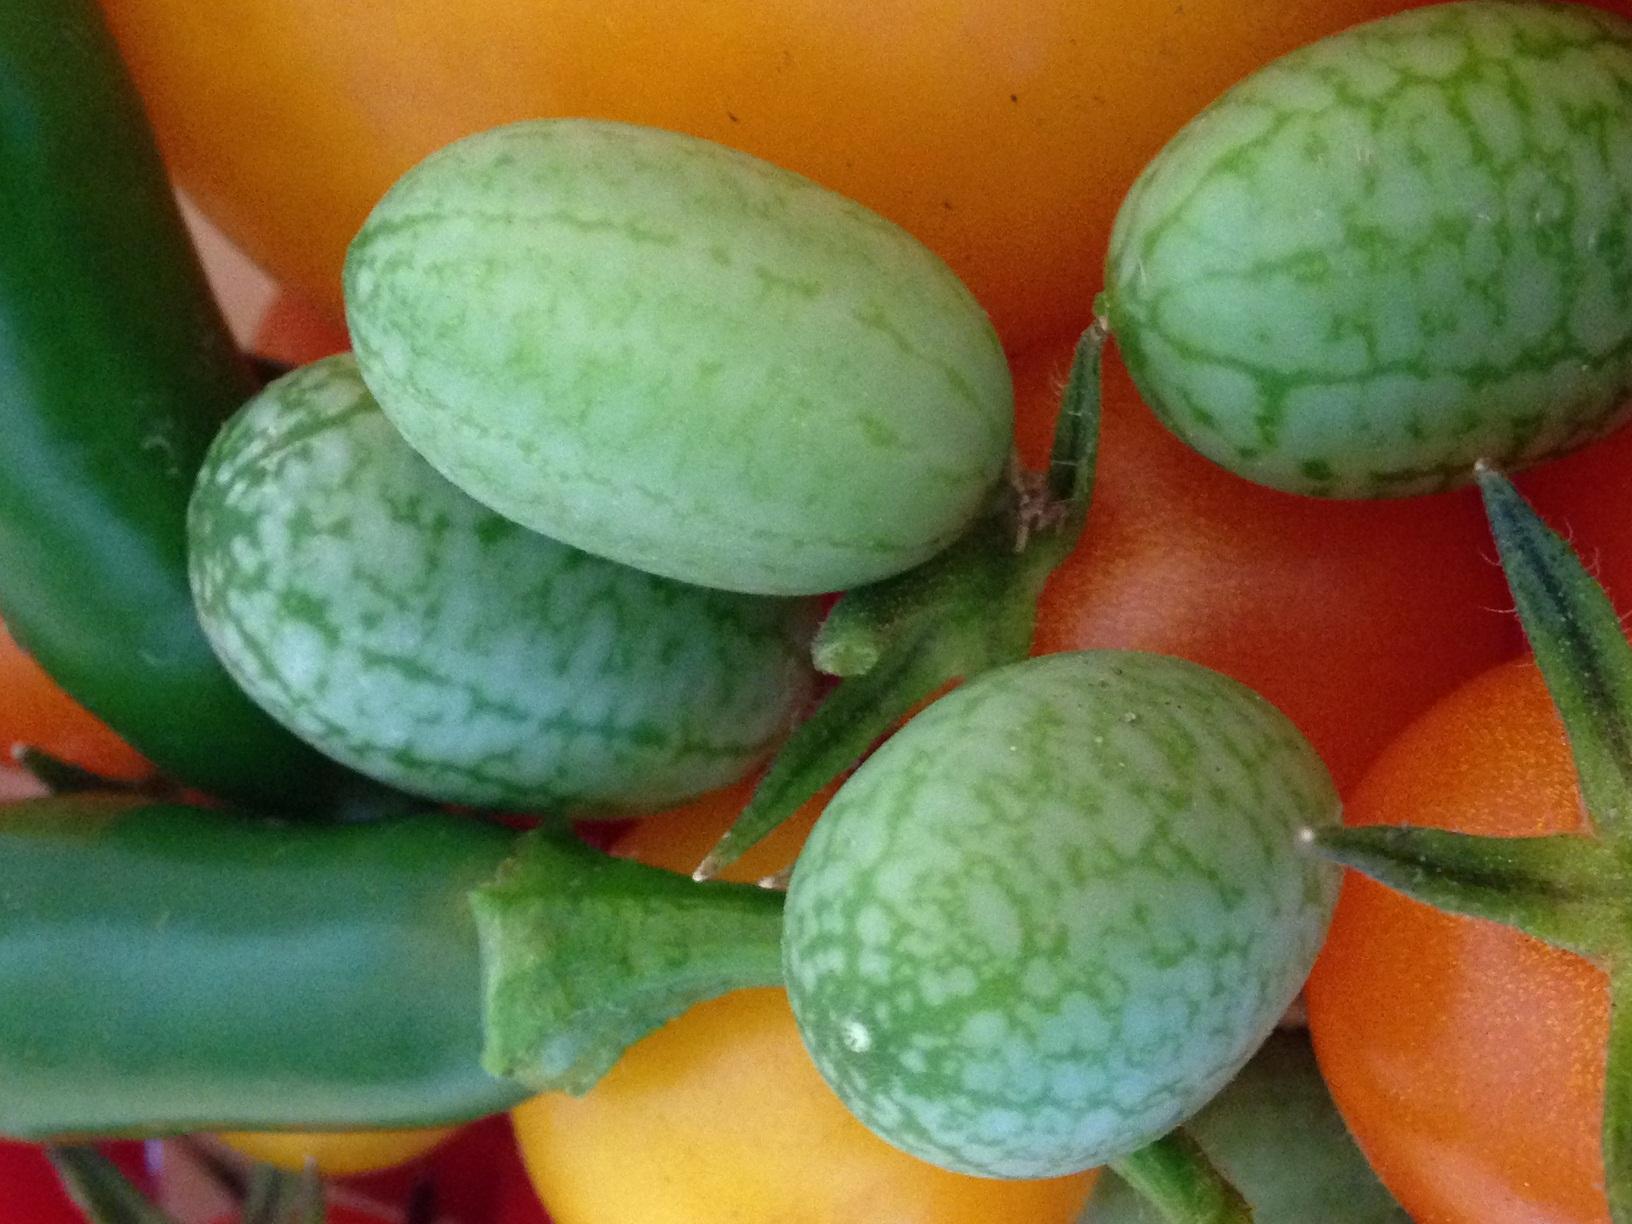 Mexican Sour Gherkin Cucumber